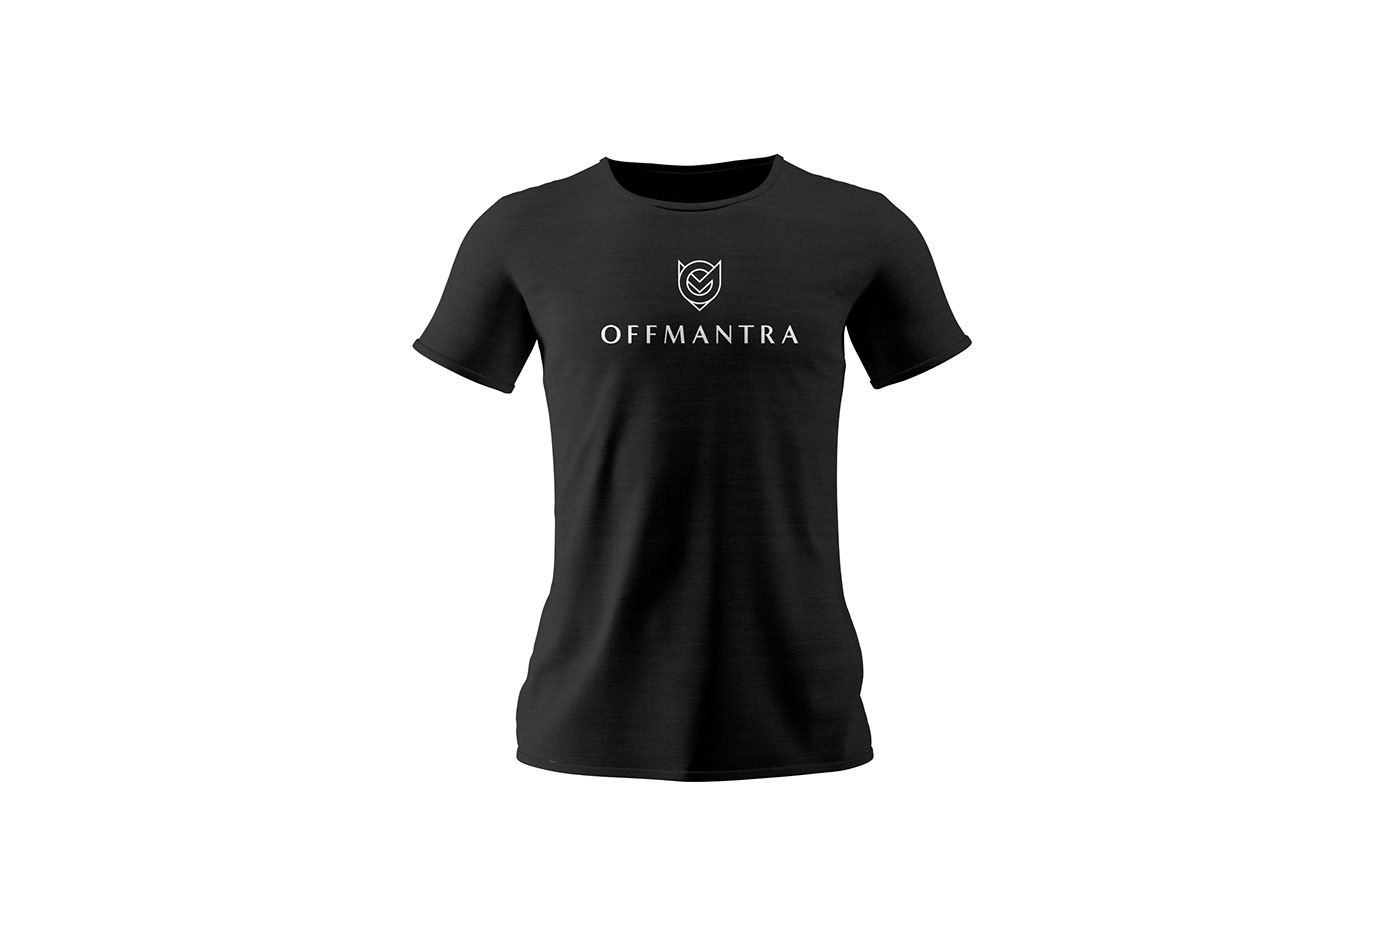 Image may contain: active shirt, sleeve and clothing